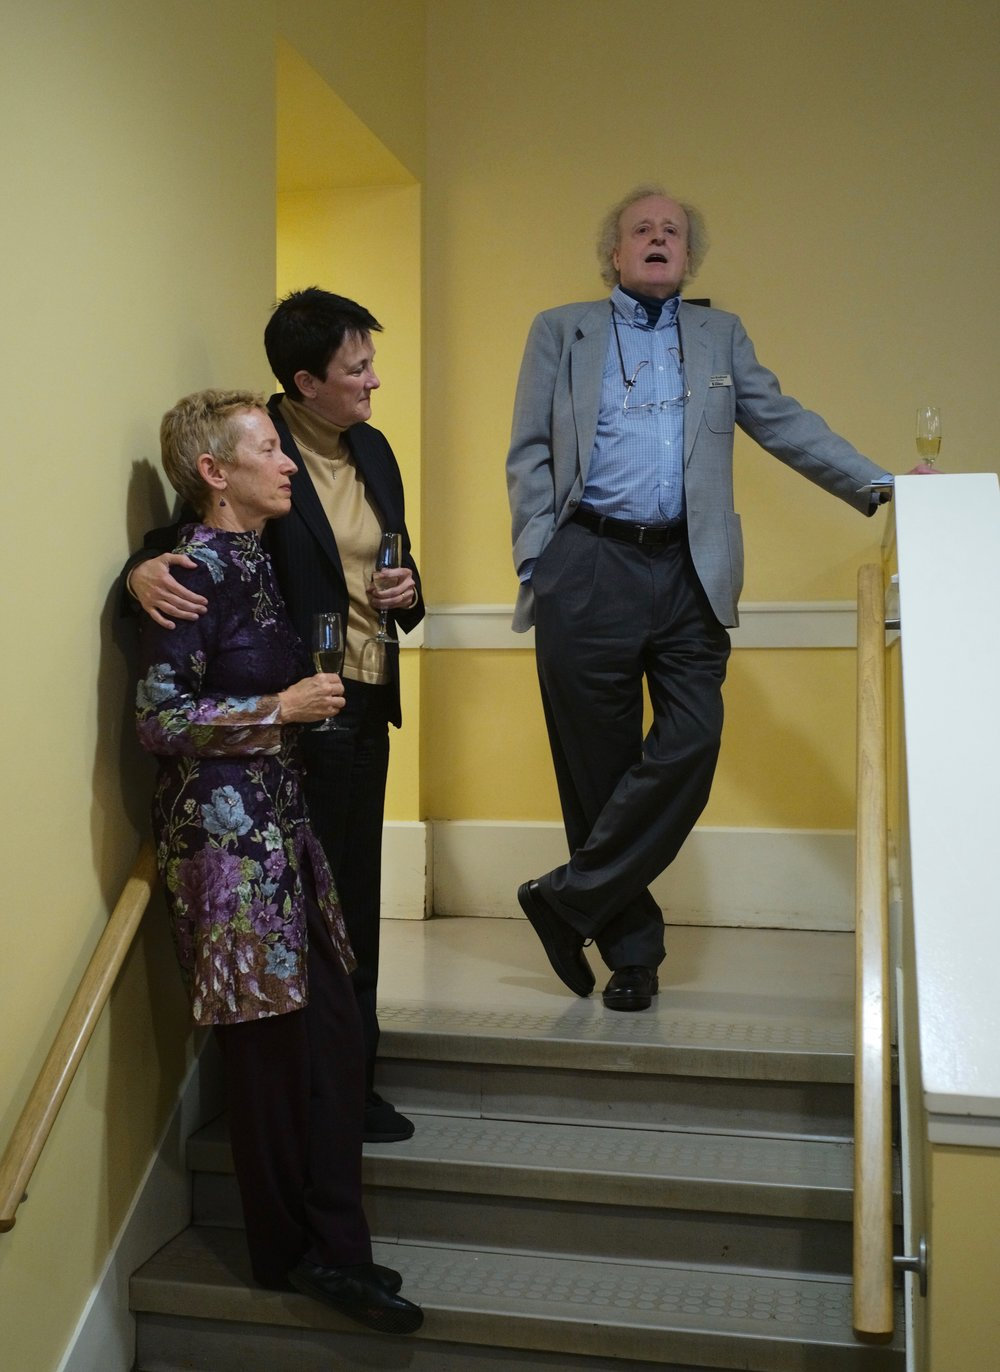 Linda Reichert, Jennifer Higdon and Richard Brodhead  Richard Brodhead invites Jennifer Higdon to propose the toast to Linda